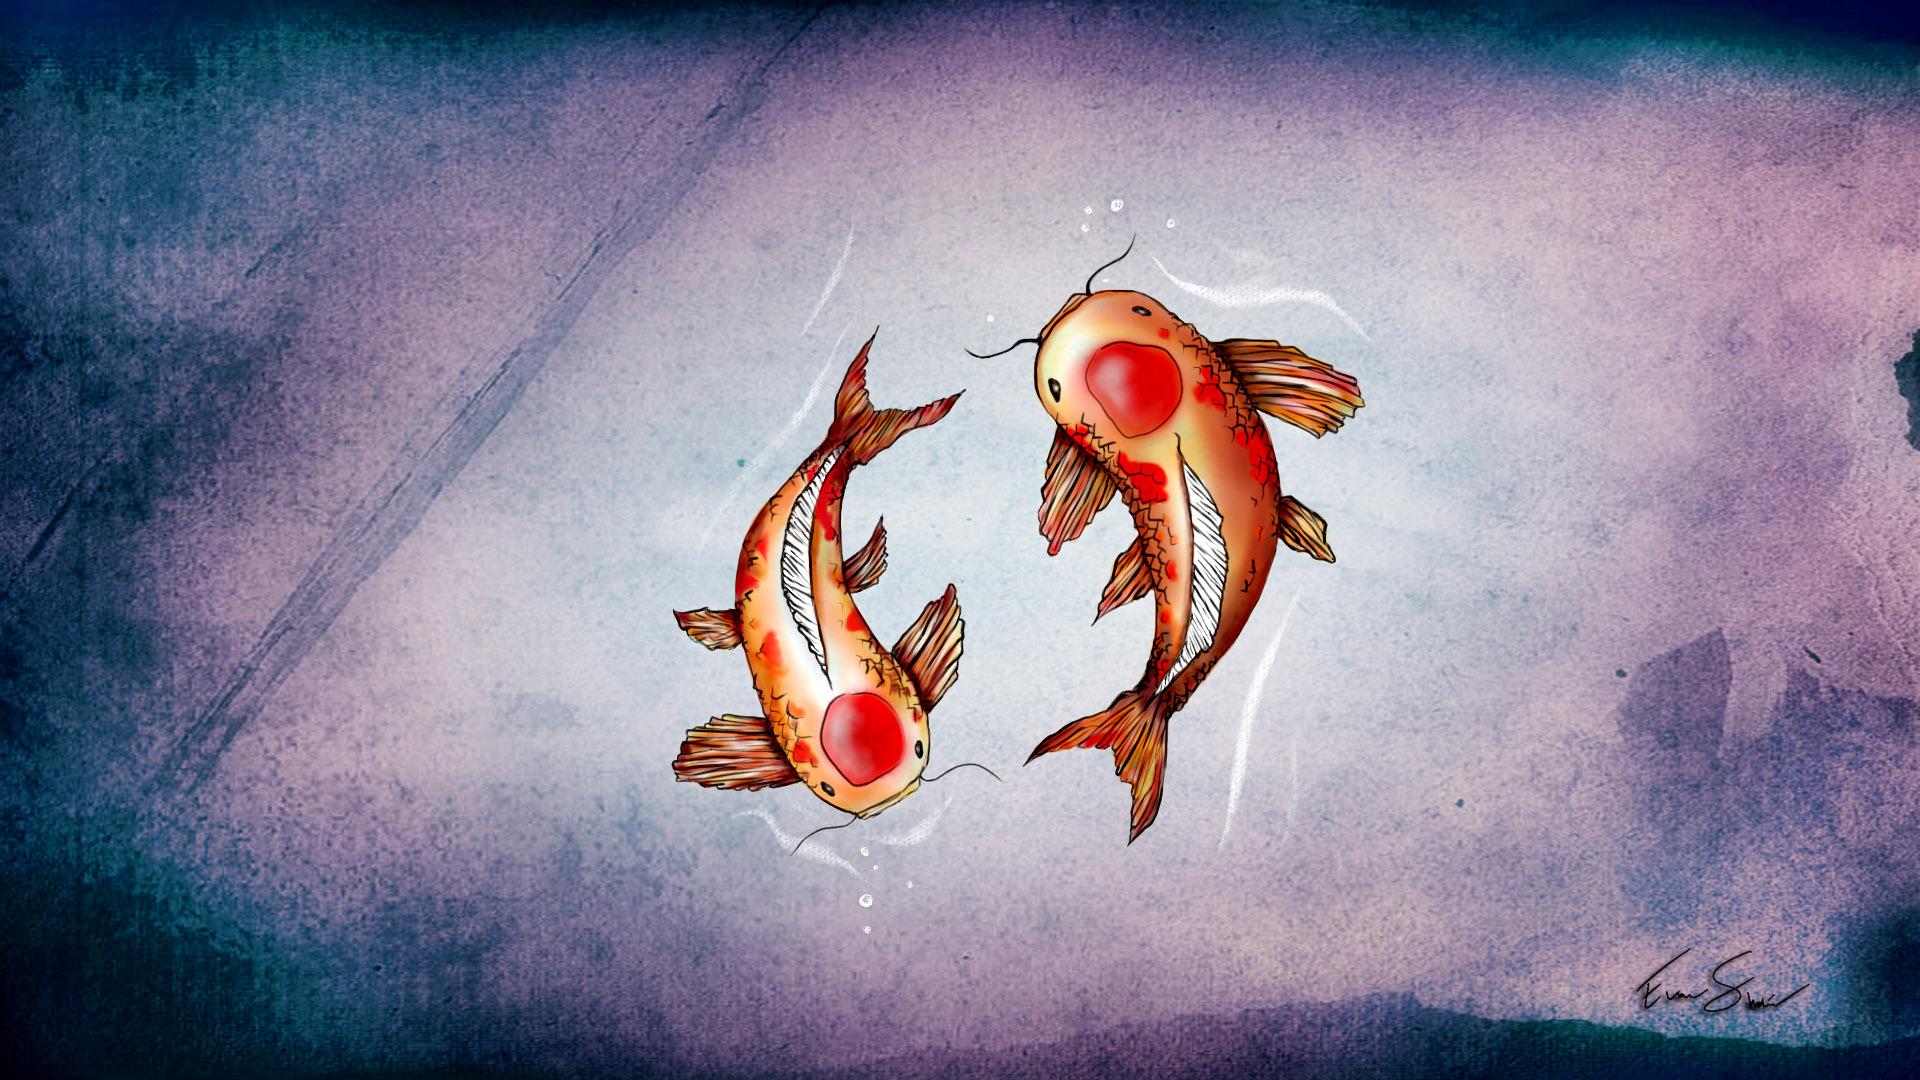 Free Download Wallpaper Koi Fish Evans Blog 1920x1080 For Your Desktop Mobile Tablet Explore 73 Koi Fish Wallpapers Koi Pond Wallpaper Aquarium Live Wallpaper For Pc Live Fish Wallpaper For Windows